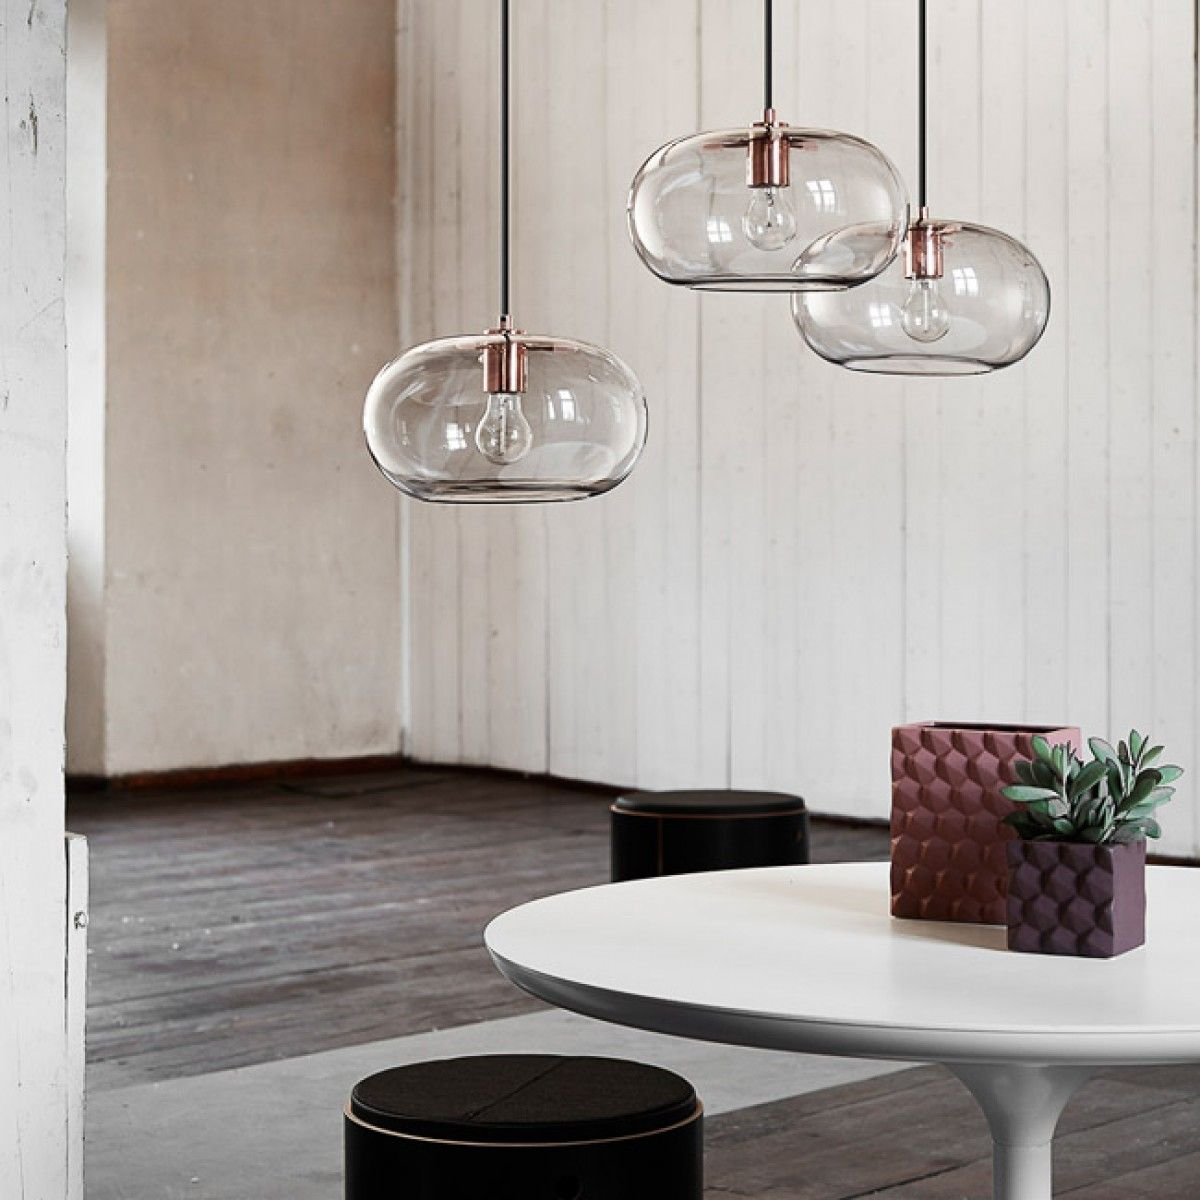 Visit designstuff to purchase a range of unique iconic lighting by Frandsen Lighting Denmark. Shop our online store today. & FRANDSEN Kobe Smoke Glass and Copper Pendant Lamp   Pinterest ...